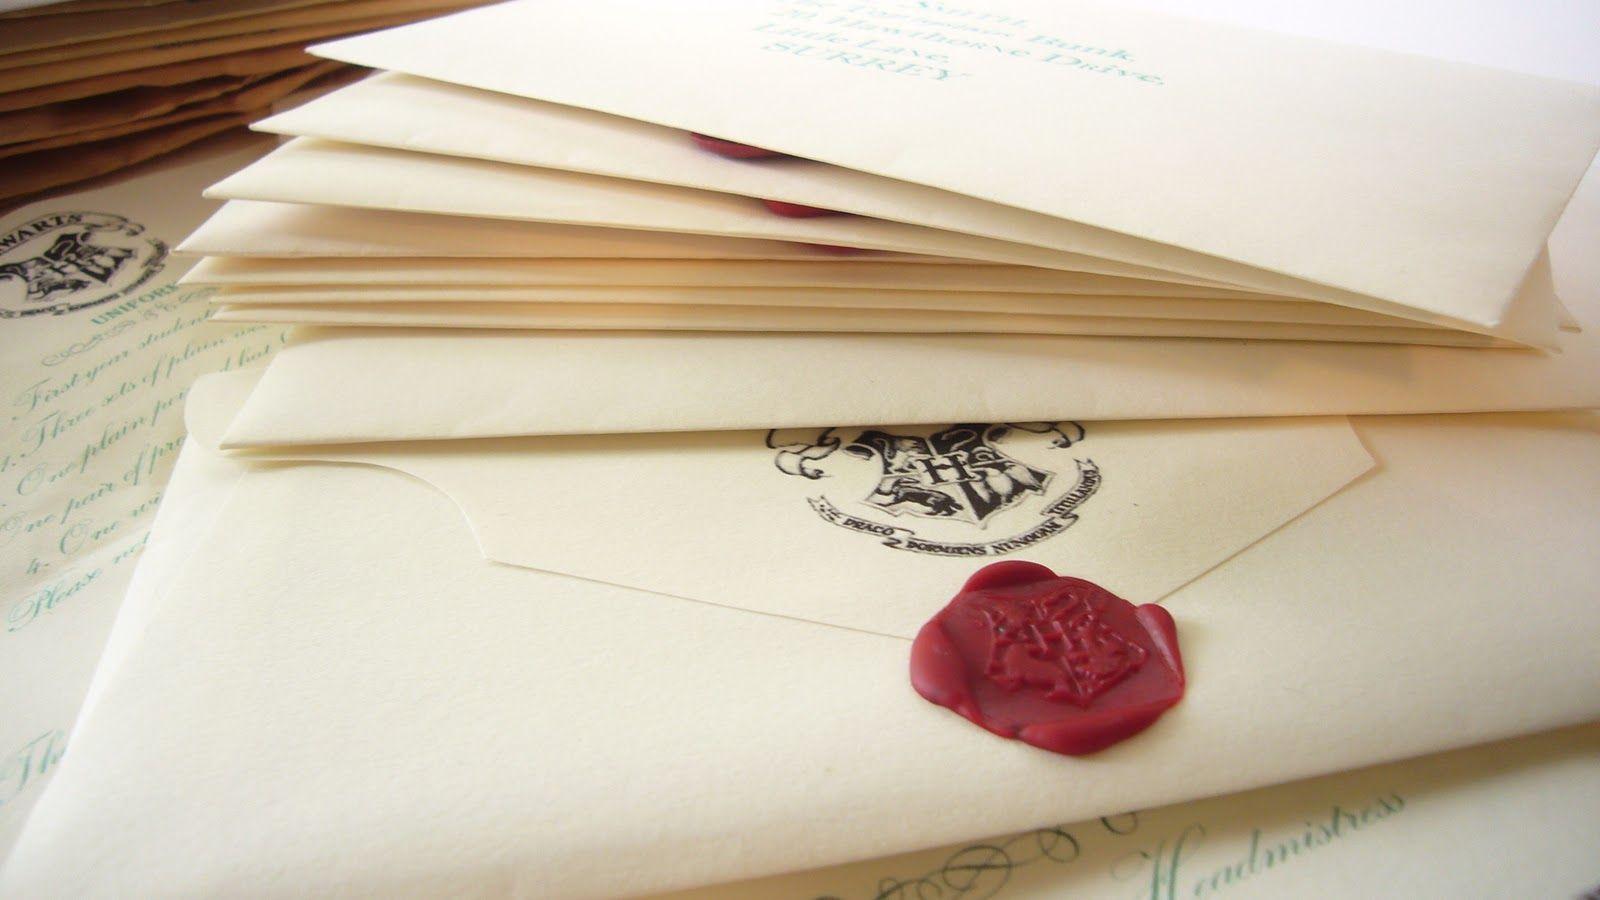 Download Wallpaper Harry Potter Letter - b3b3f7ad96c202f27008e4193e0b5272  Image_266869.jpg